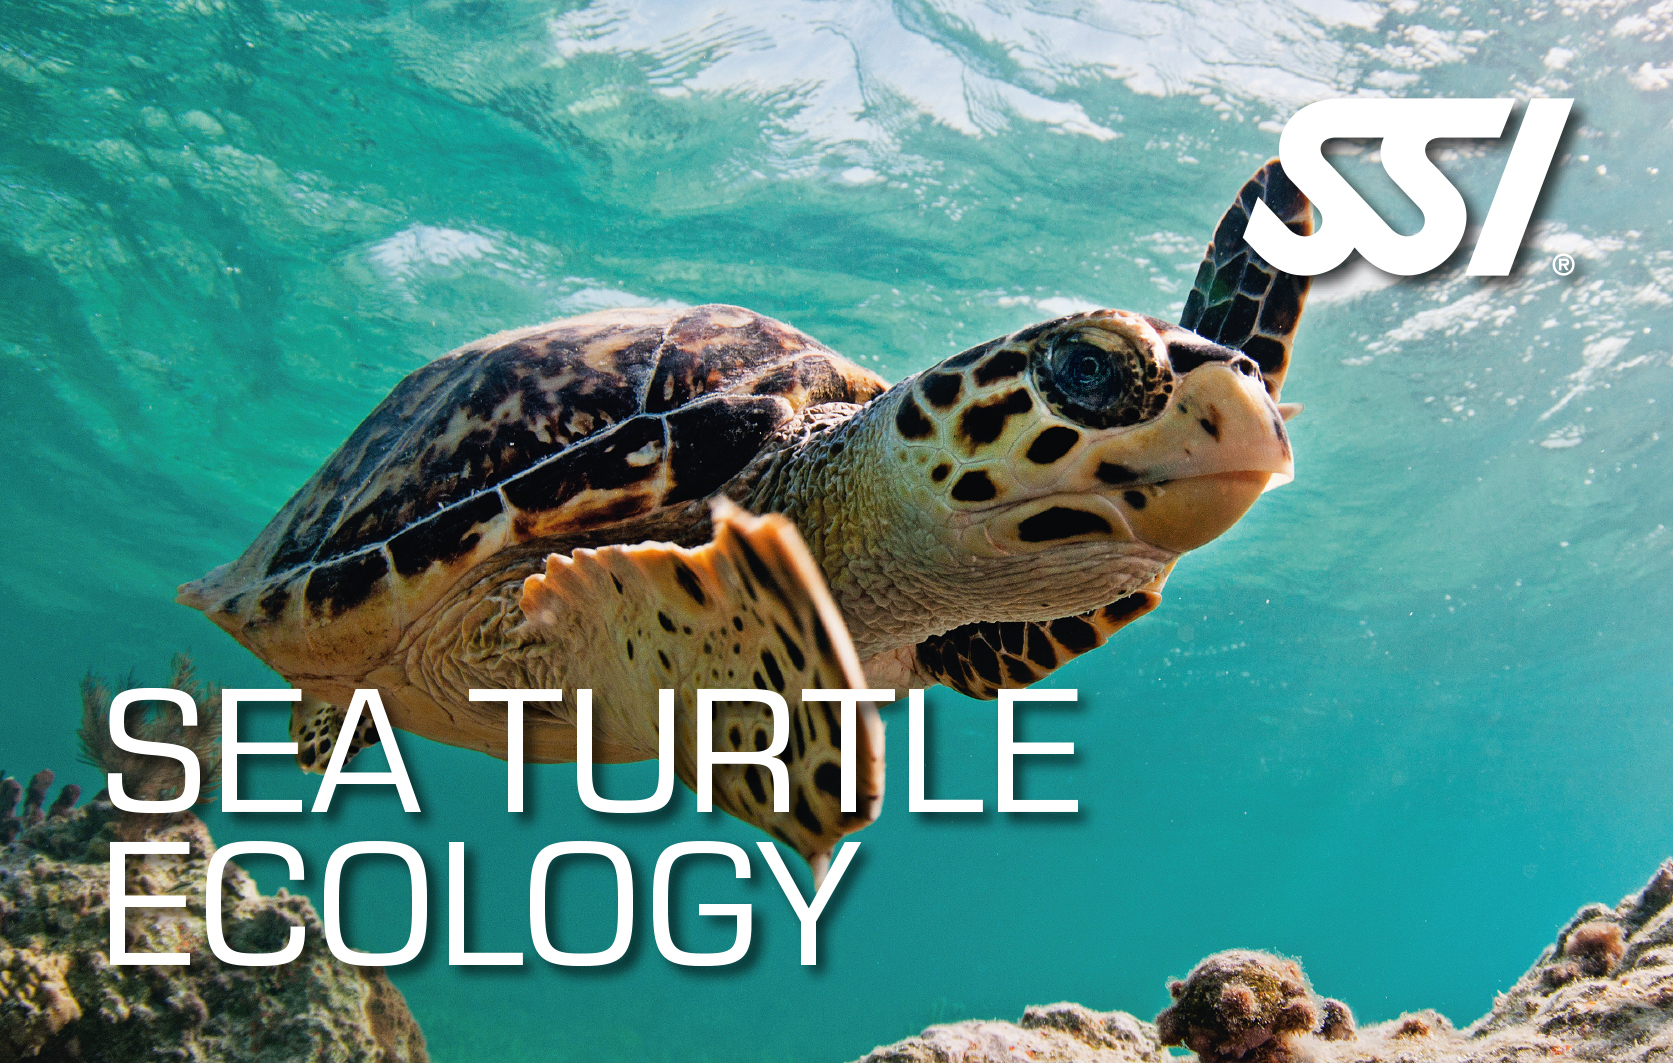 SSI Turtle Ecology